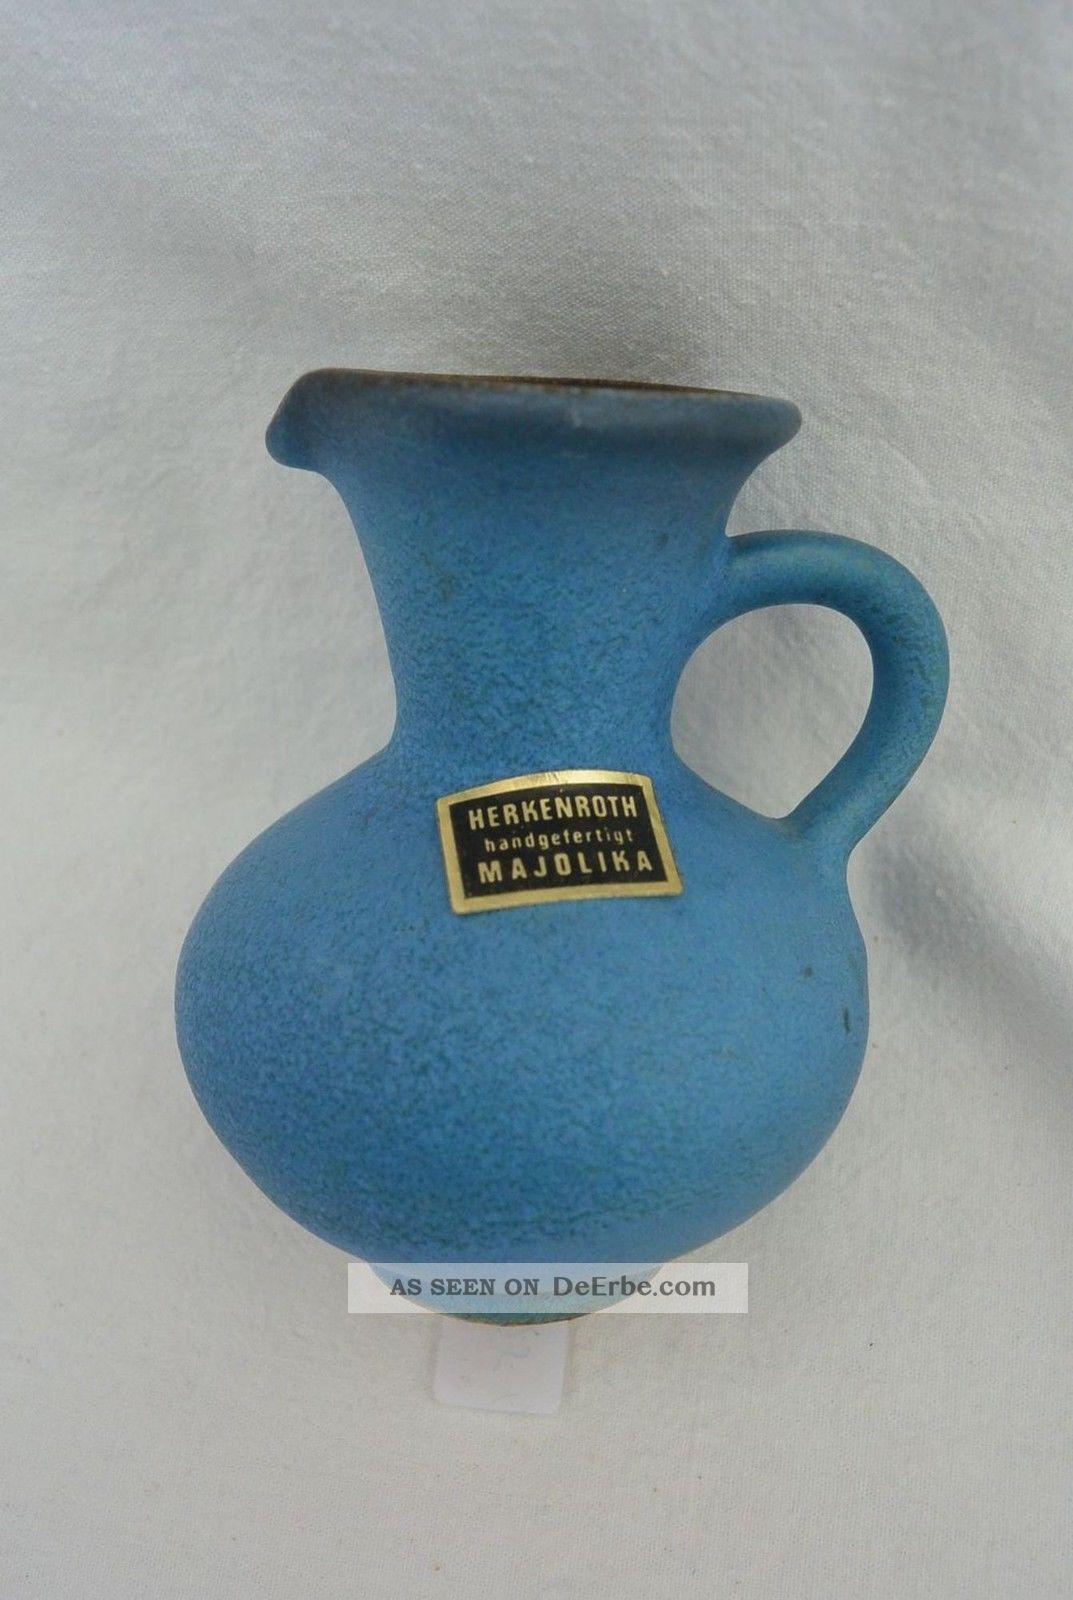 Majolika Herkenroth Kleine Tischvase Krug Handarbeit Blau Gb 1695 Nach Marke & Herkunft Bild